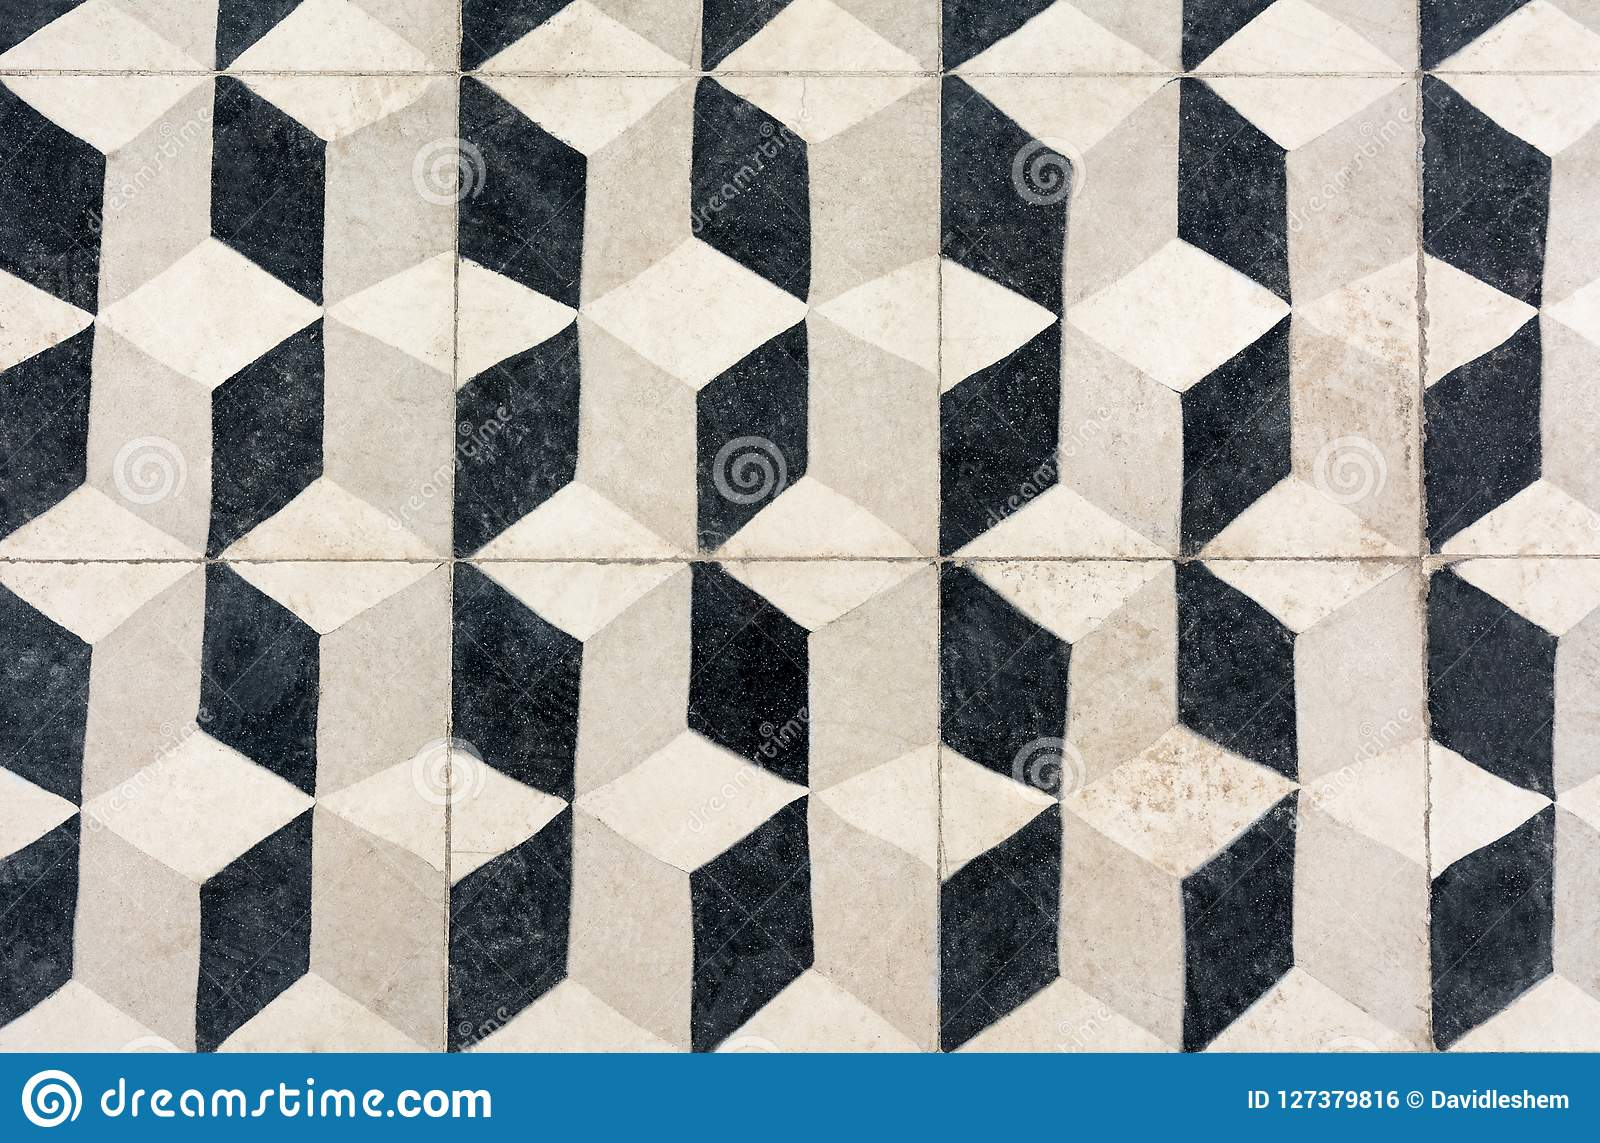 https www dreamstime com unique tile design islam patterns escher like repetition tiled floor mosque architecture image127379816